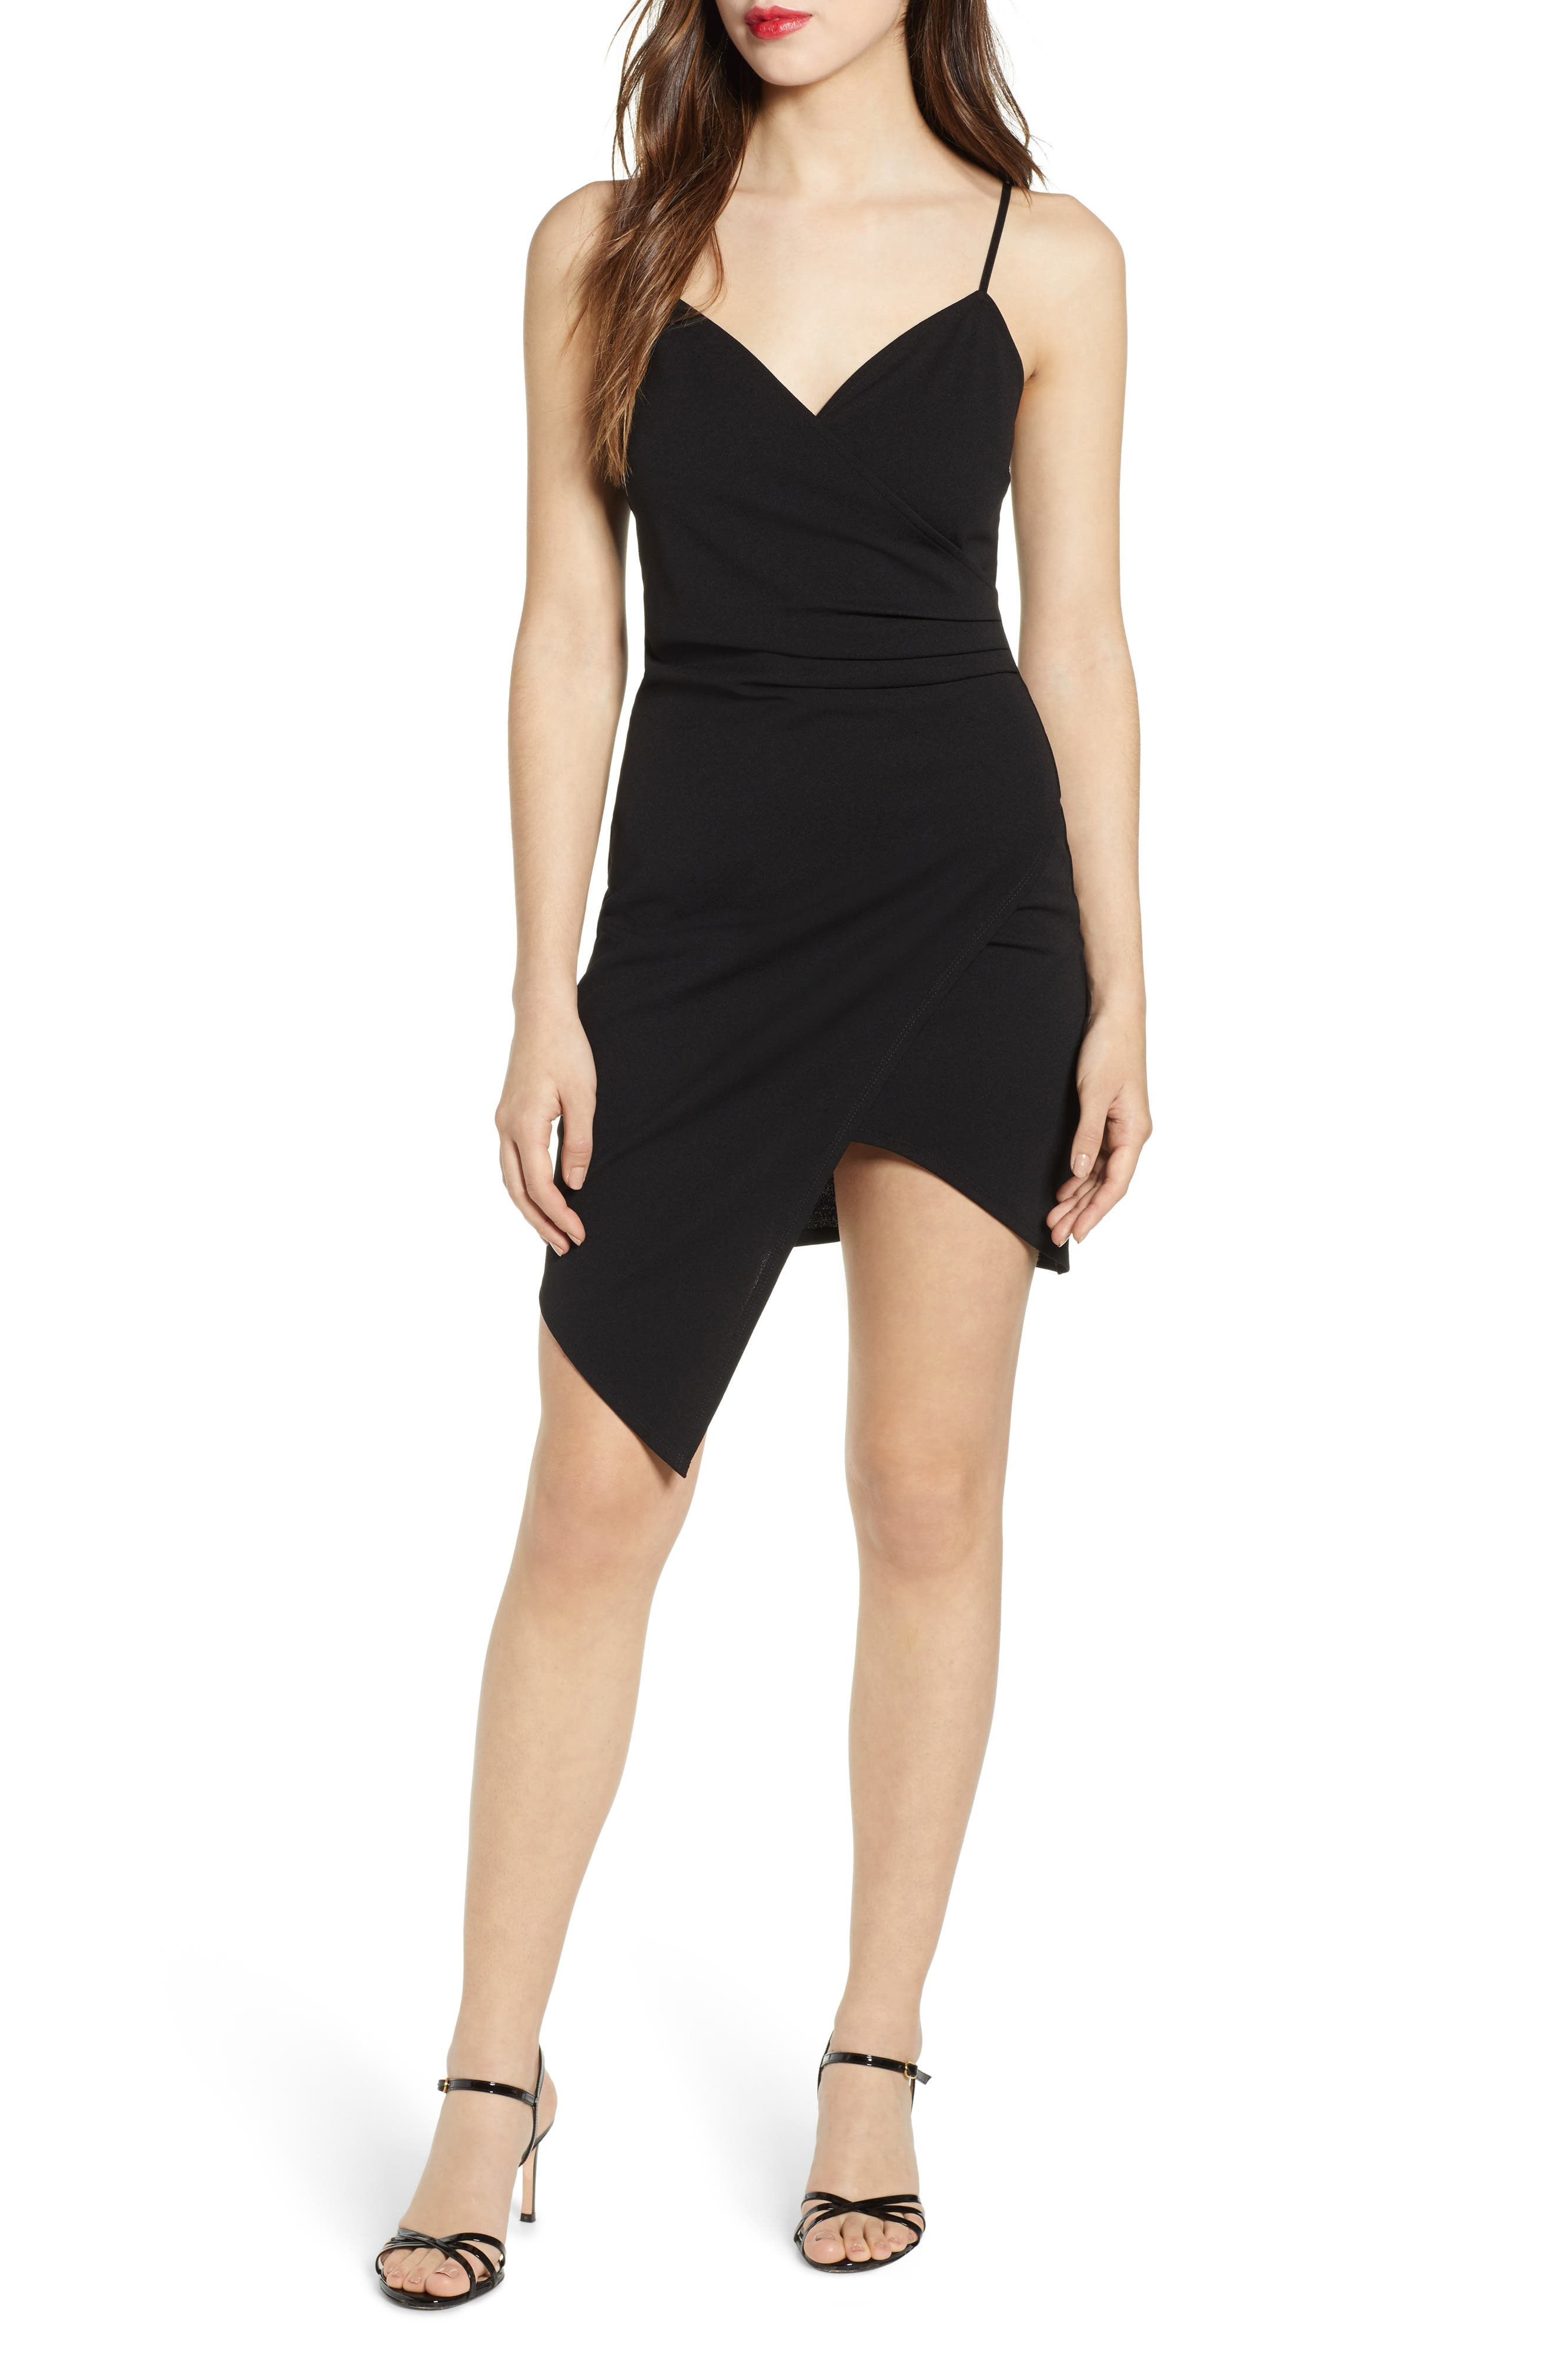 Love, Nickie Lew Asymmetrical Body-Con Dress, Black